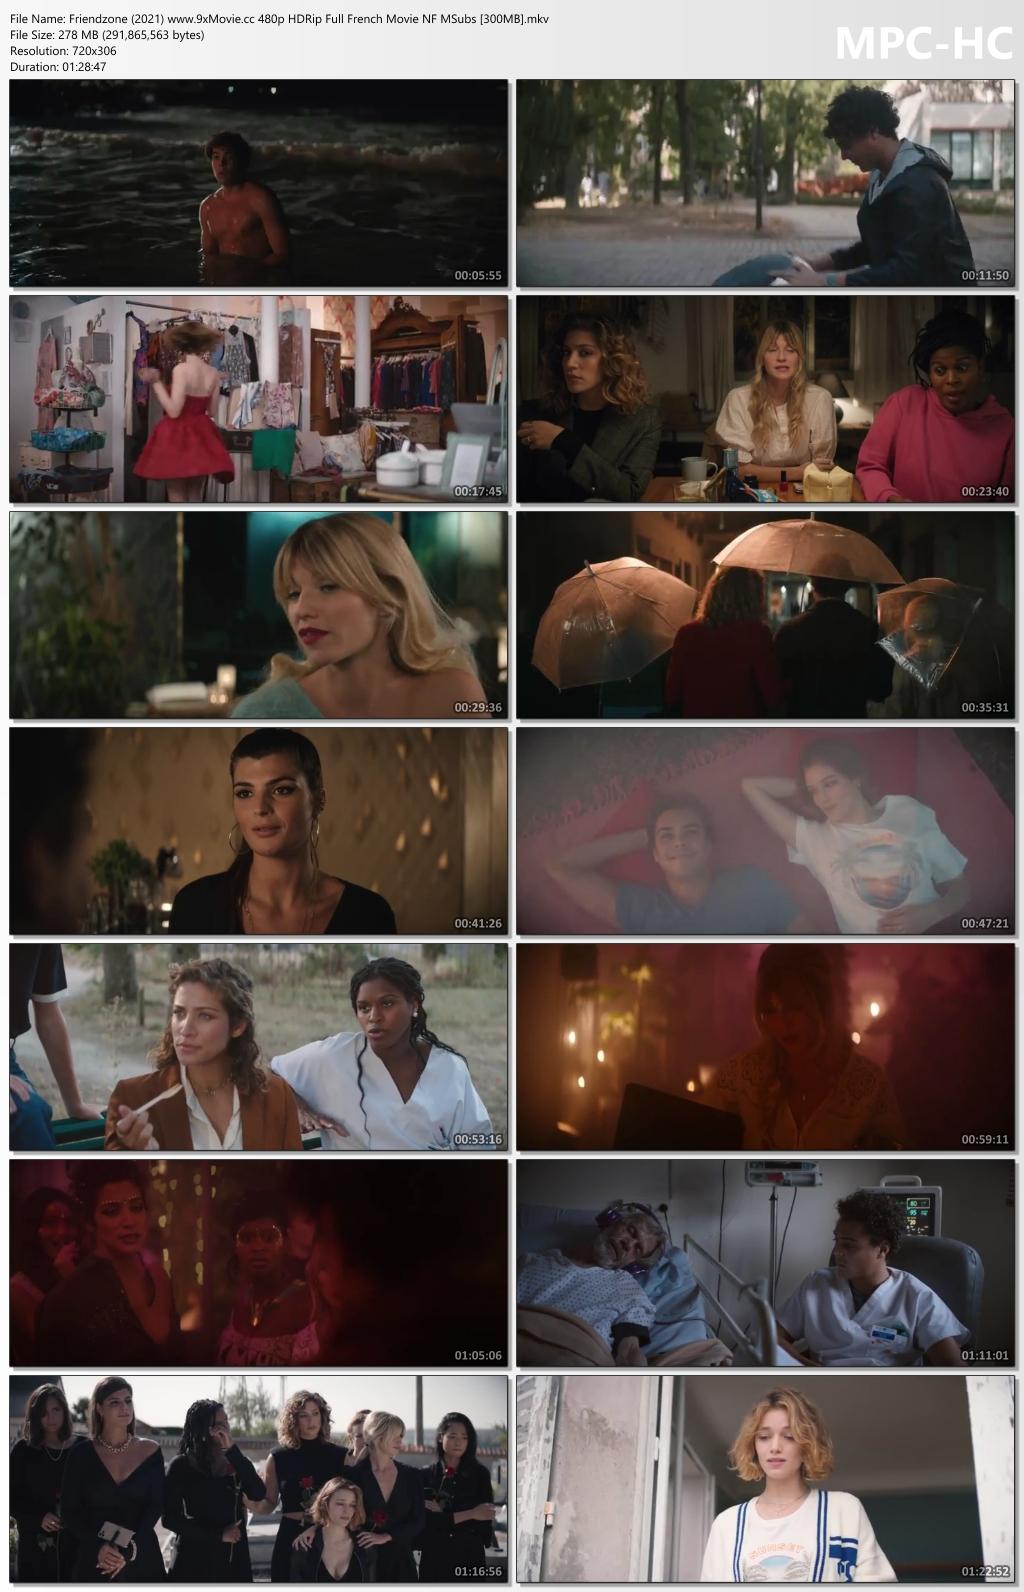 Friendzone-2021-www-9x-Movie-cc-480p-HDRip-Full-French-Movie-NF-MSubs-300-MB-mkv